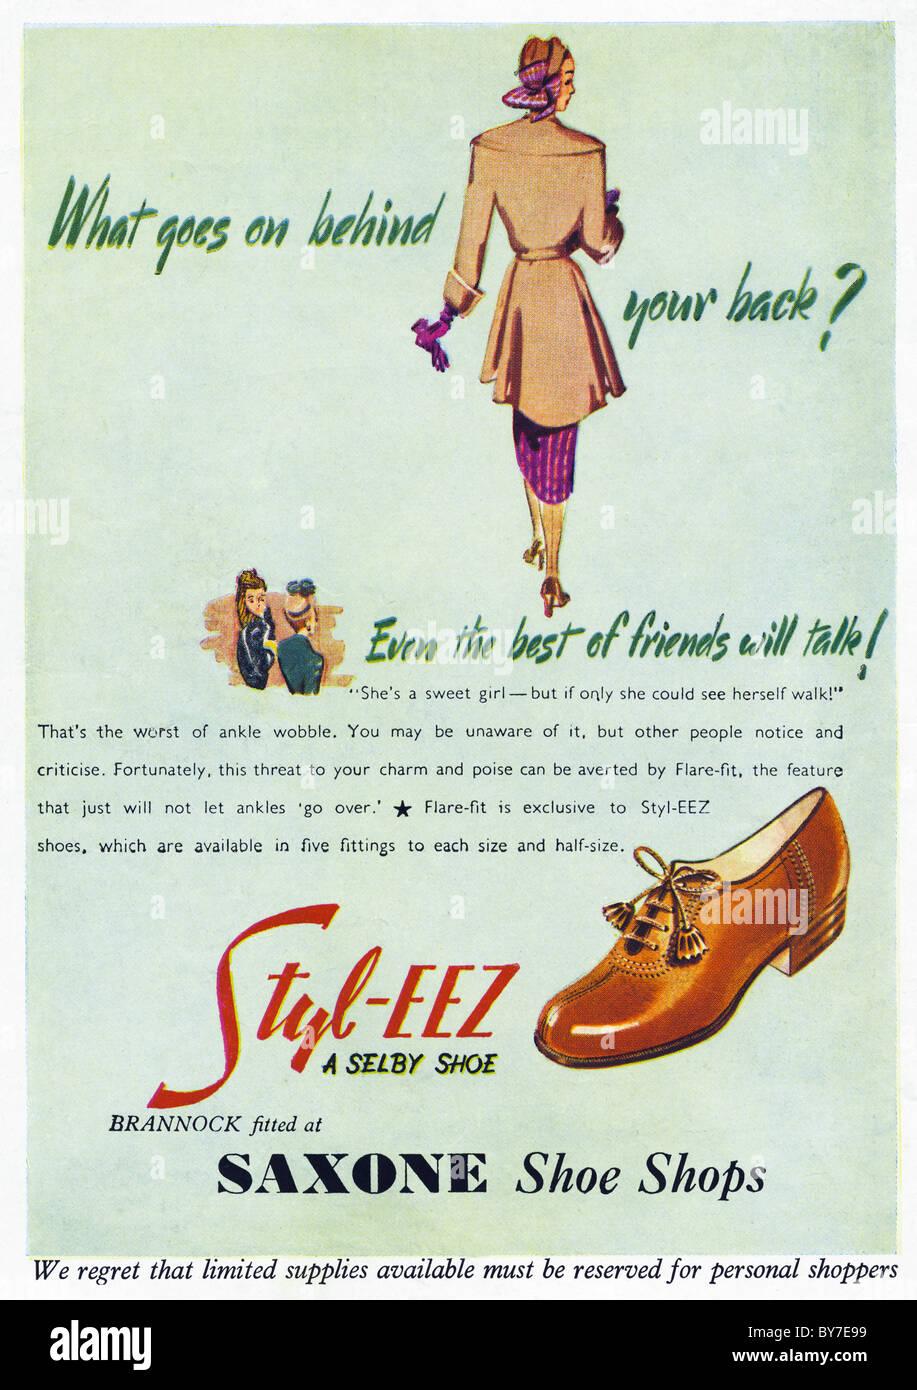 STYL-EEZ ladies shoes advert in women's magazine 1940s advertisement - Stock Image